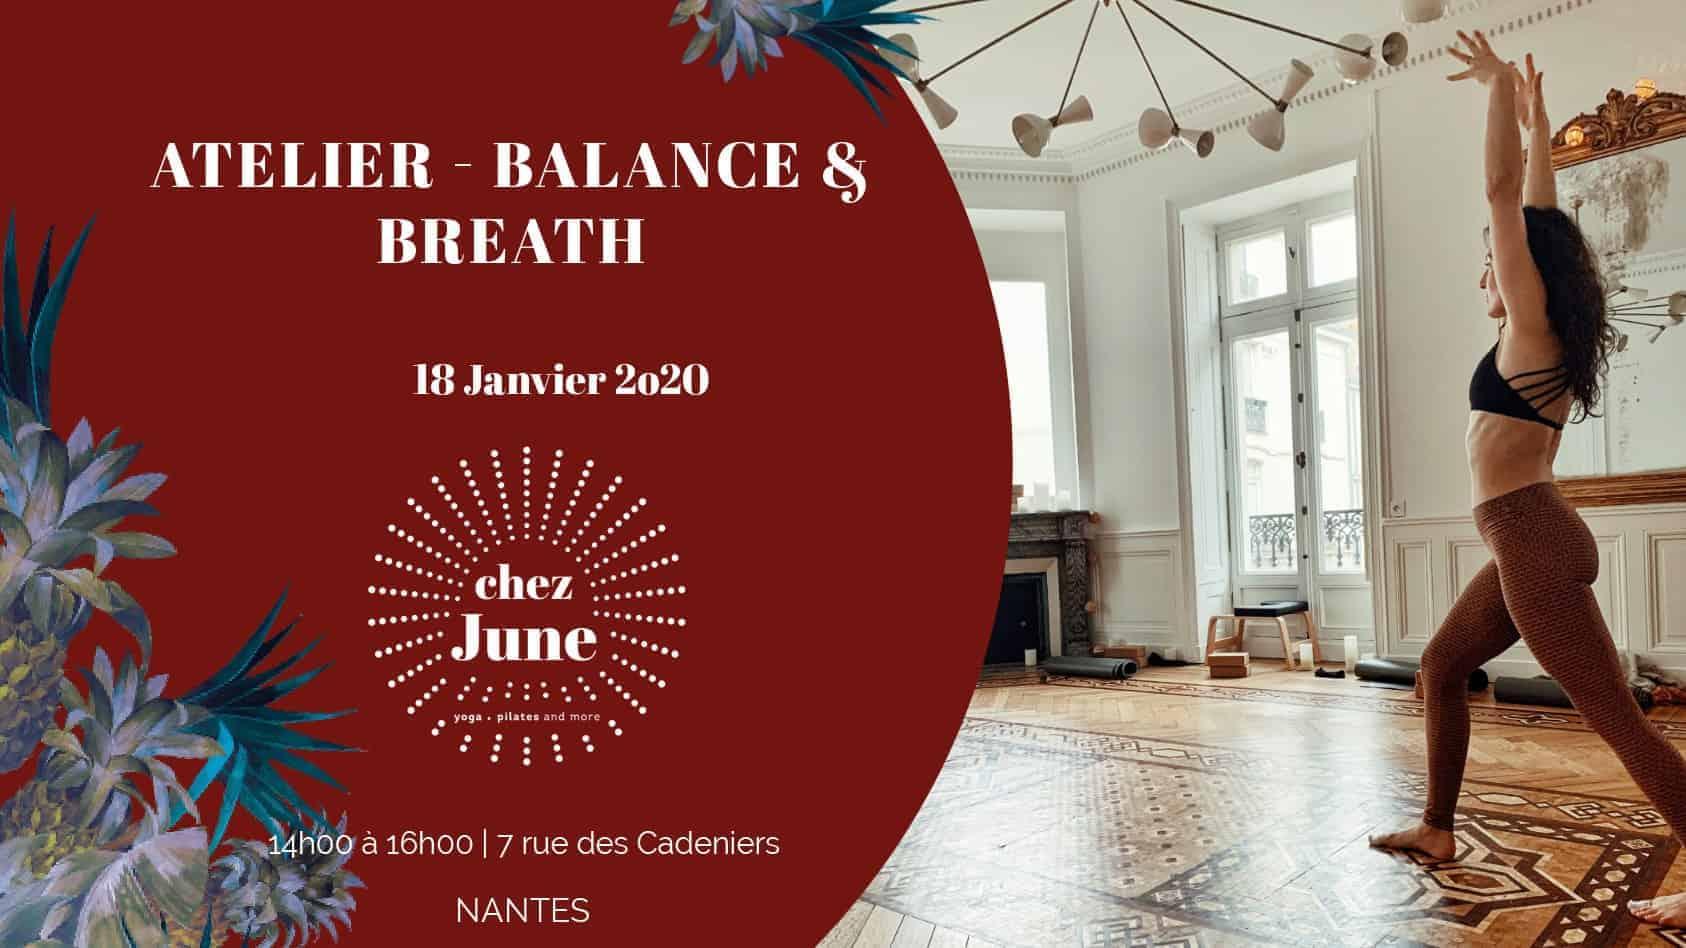 chez june nantes atelier balance and breath